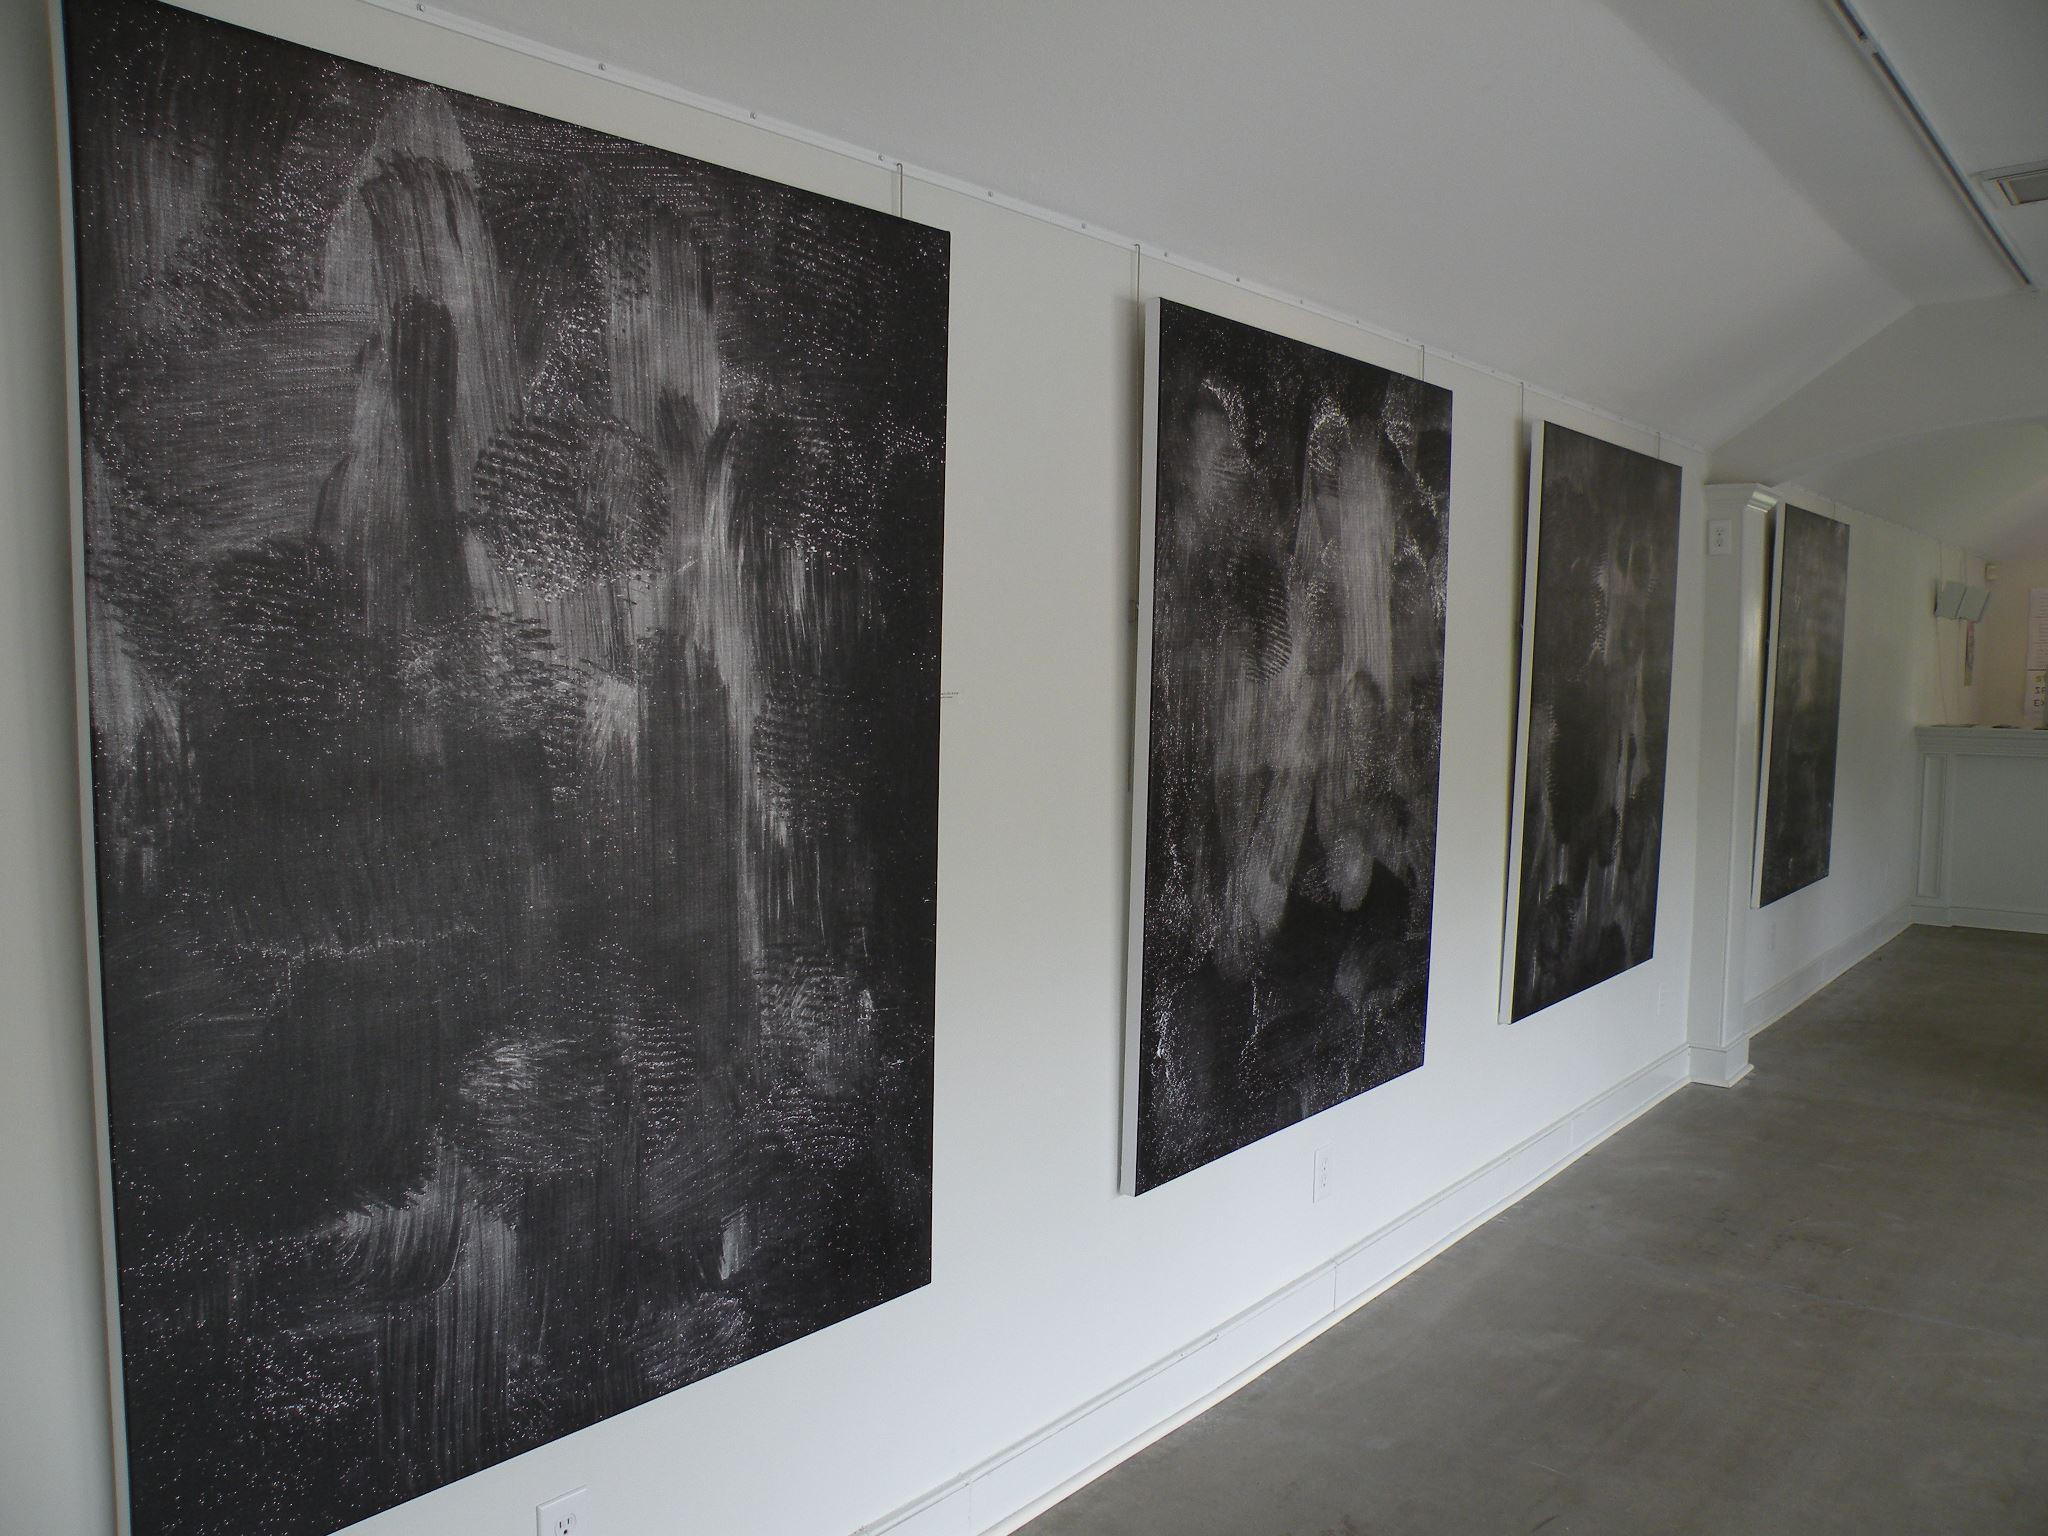 Exhibit view, Start Gallery, 2013